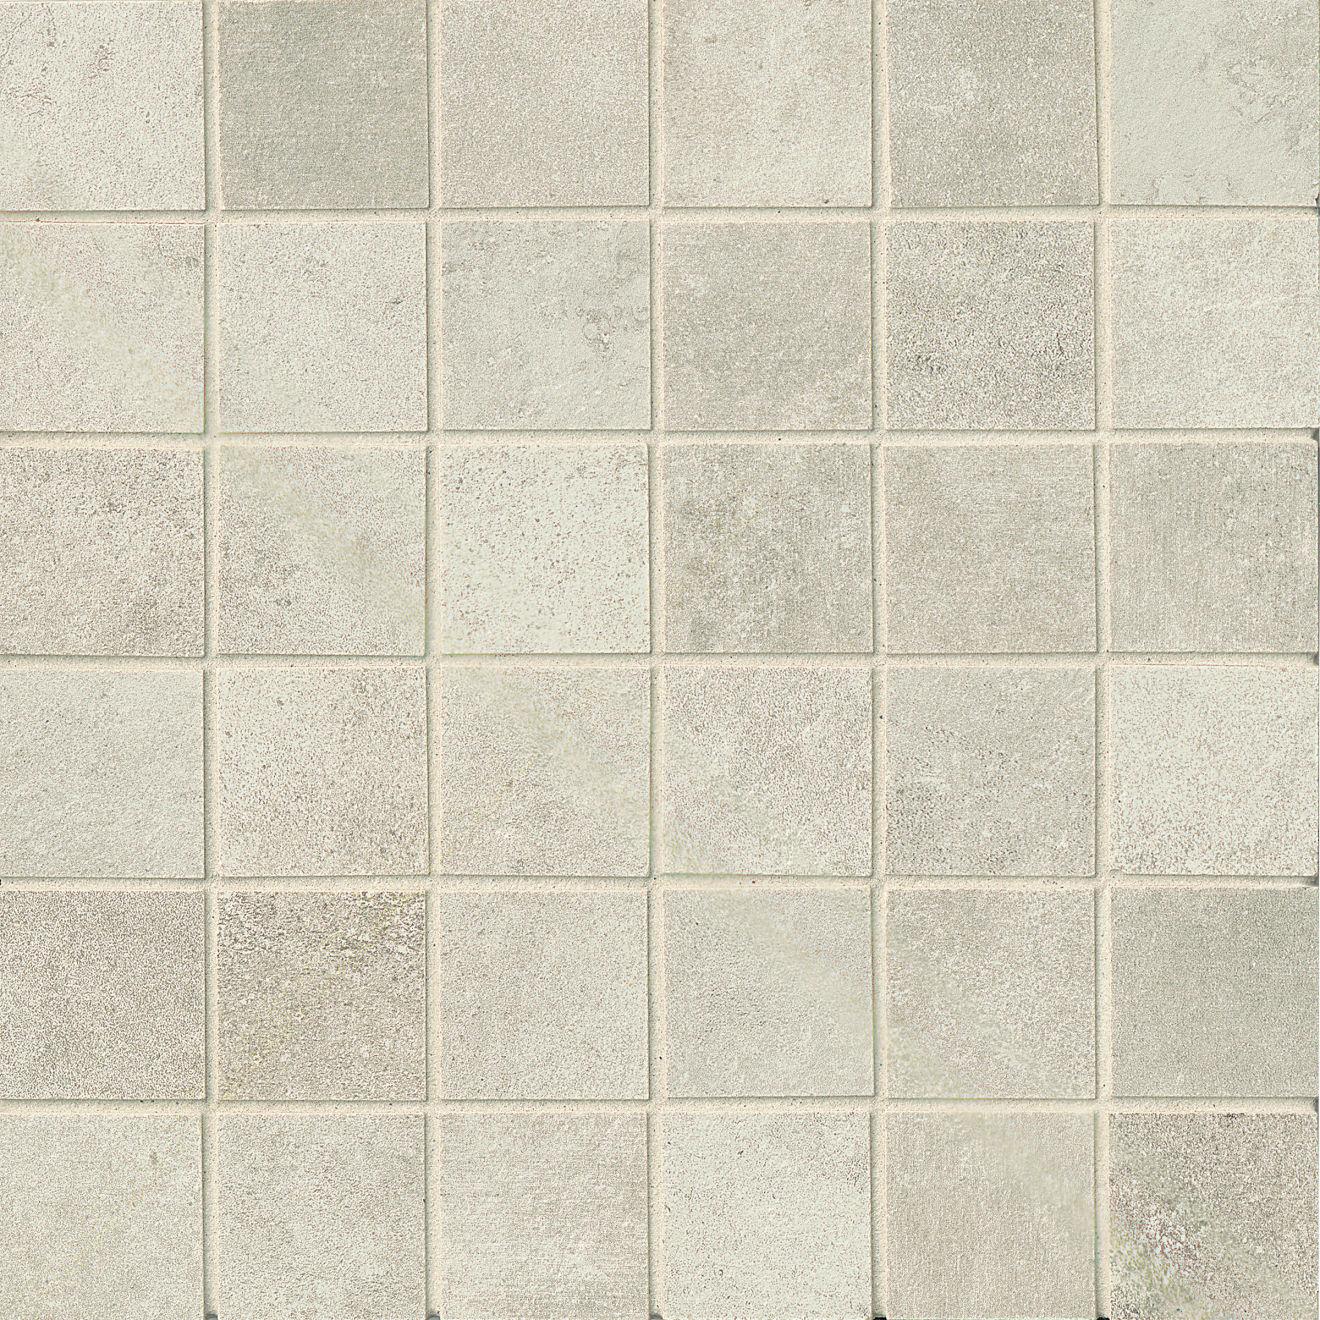 "Officine 2"" x 2"" Floor & Wall Mosaic in Acid (OF 01)"